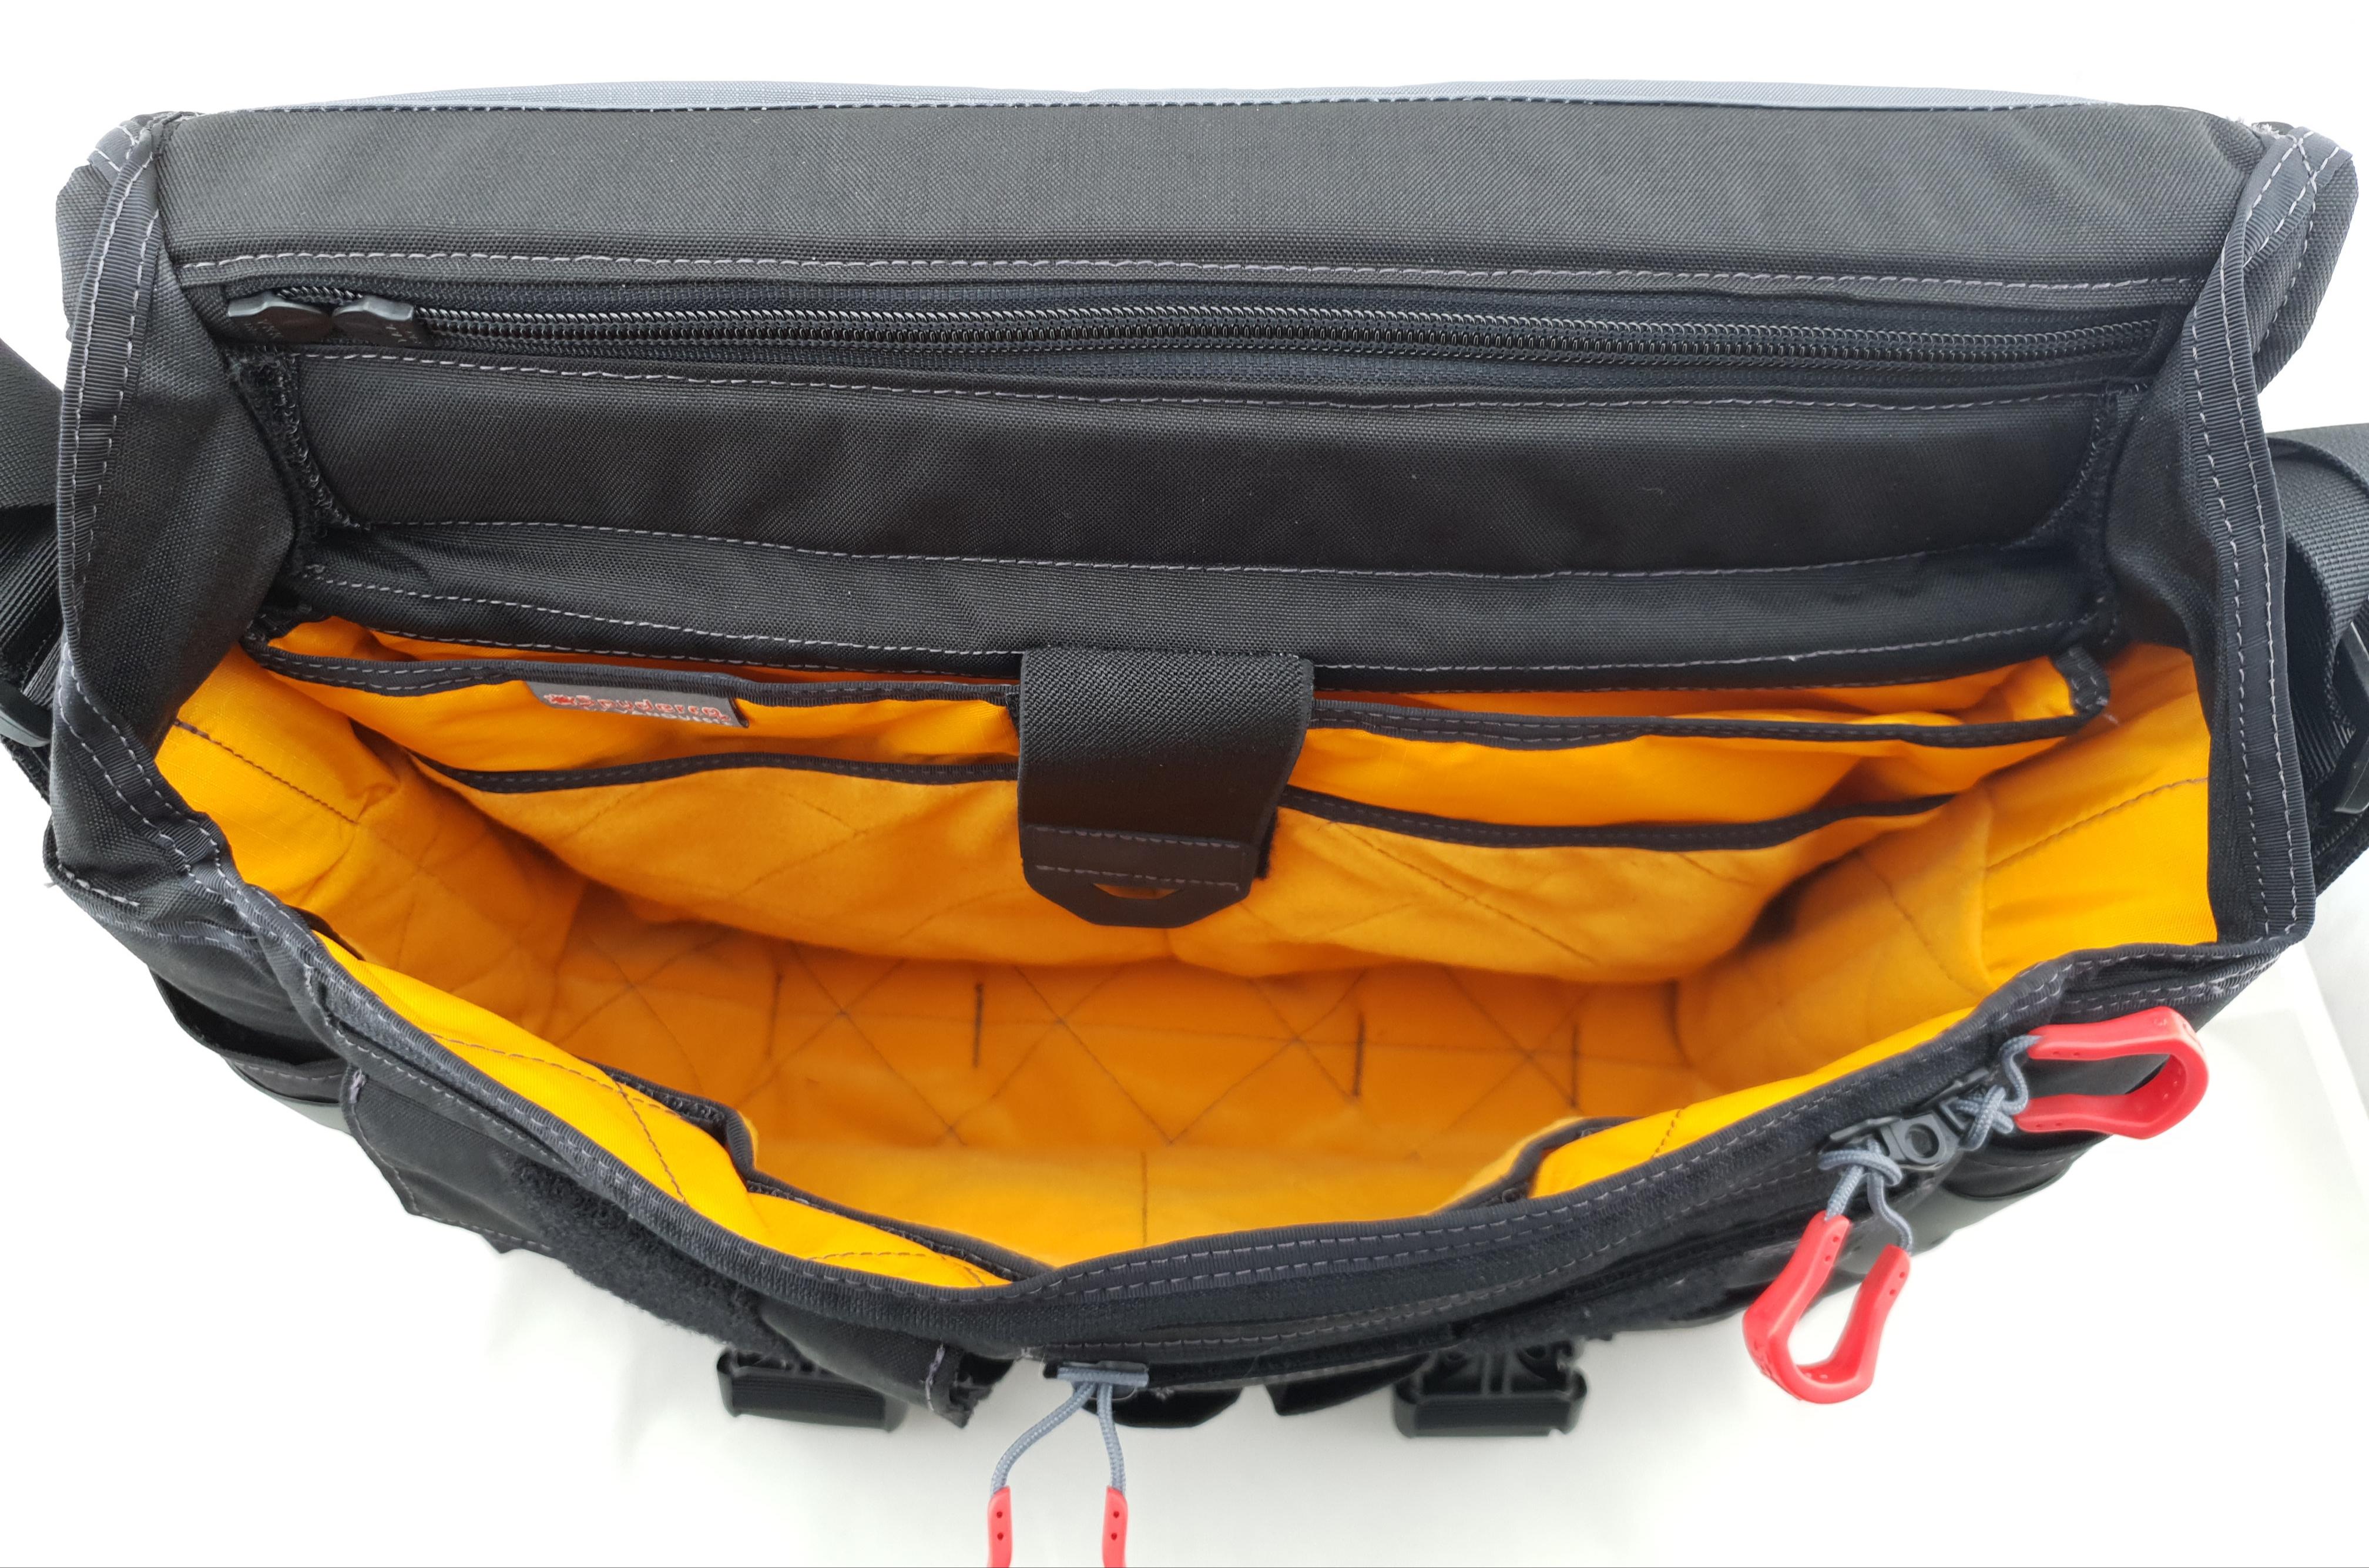 Spyderco Vanquest bag inside view